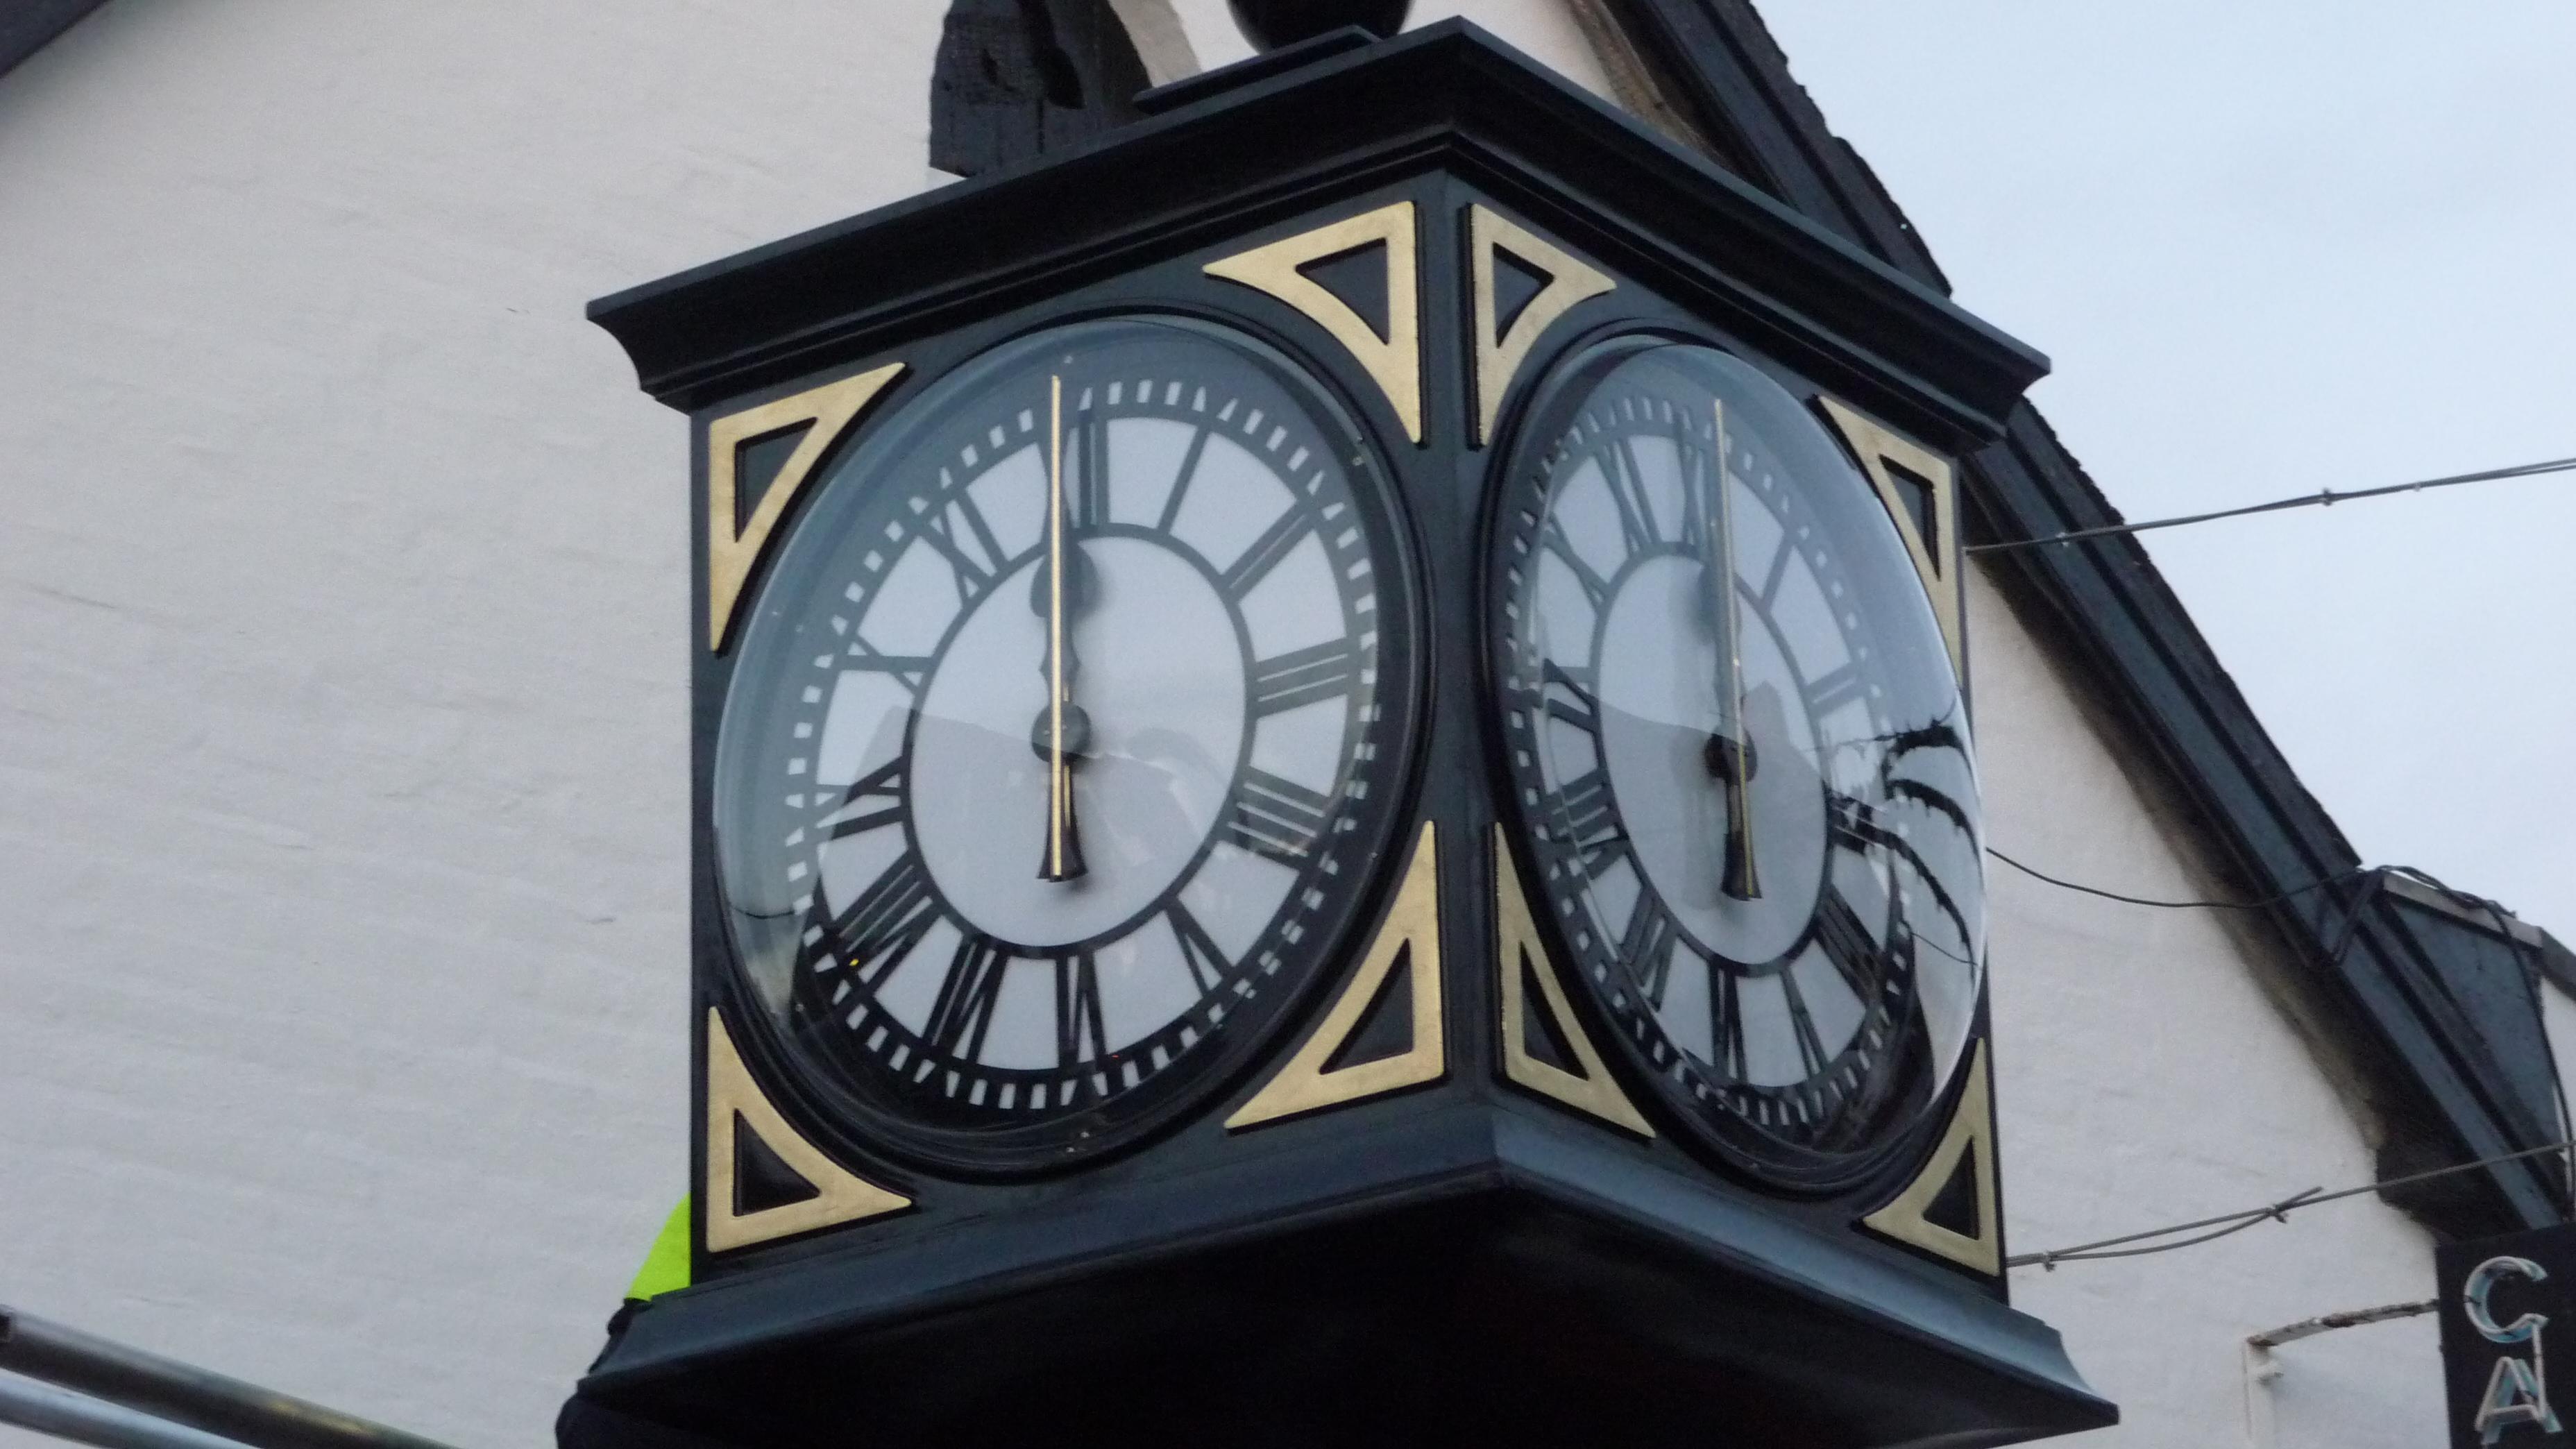 Black pillar clock